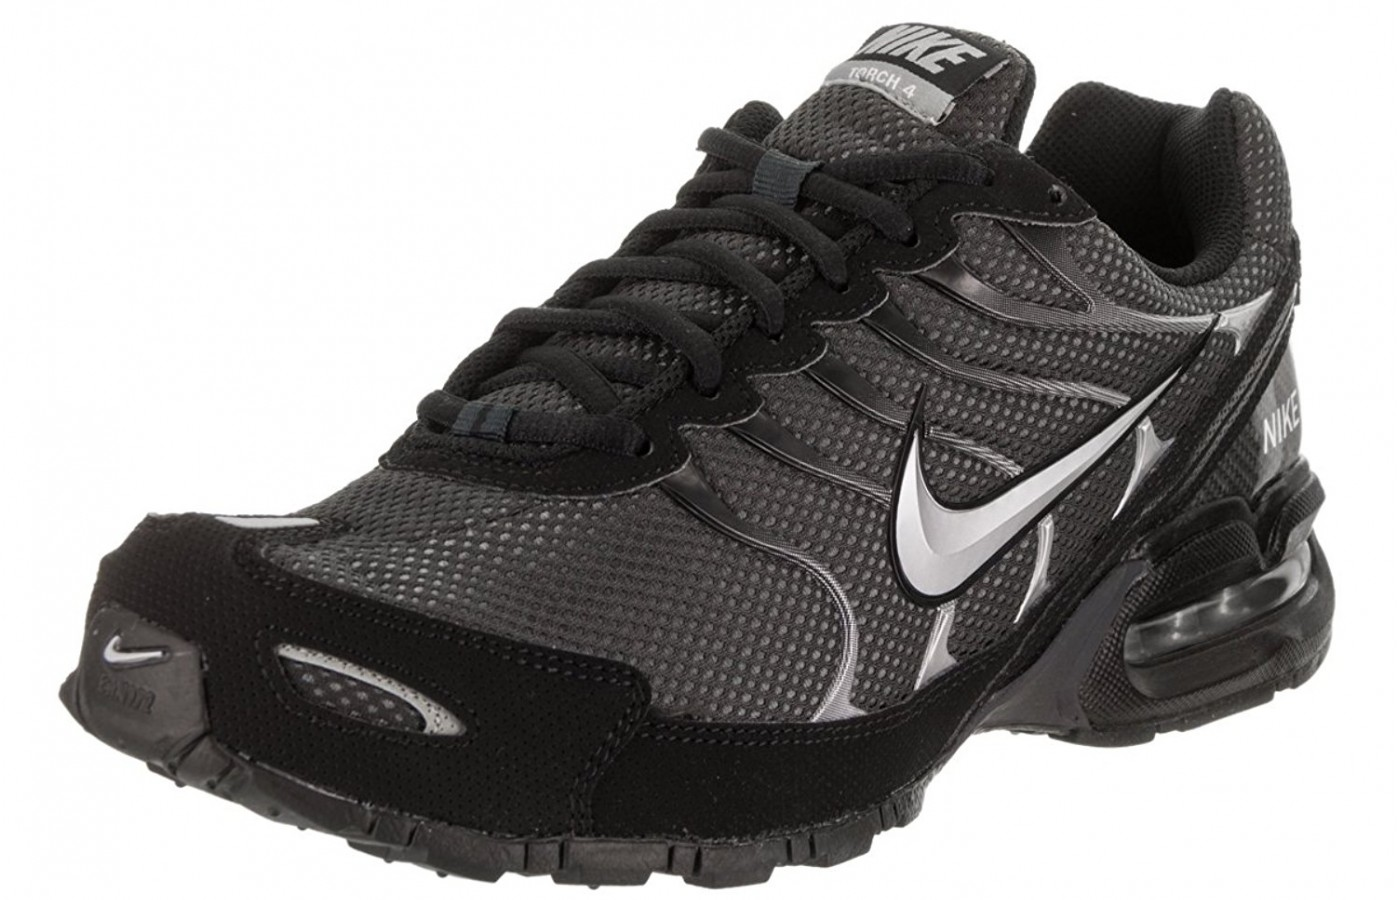 Nike Air Max Torch  Mens Running Shoe Review